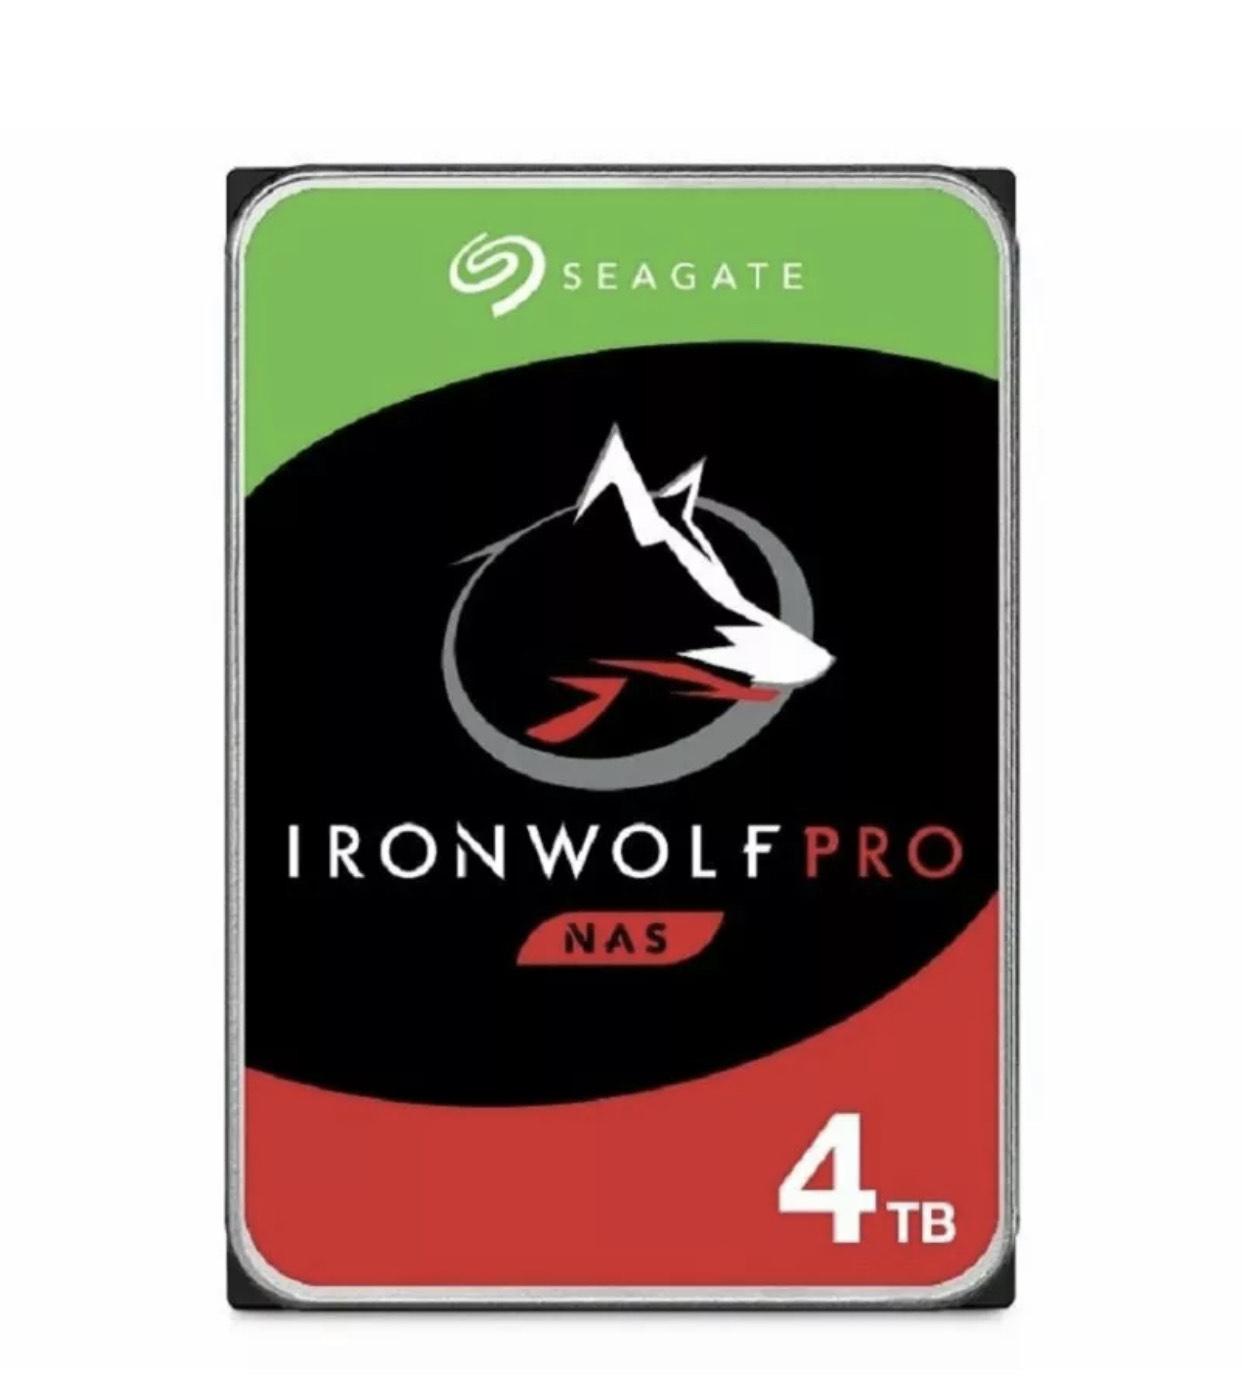 Seagate IronWolf 4TB NAS Hard Drive - £88.18 / Pro £125.54 @ eBay / eBuyer with code